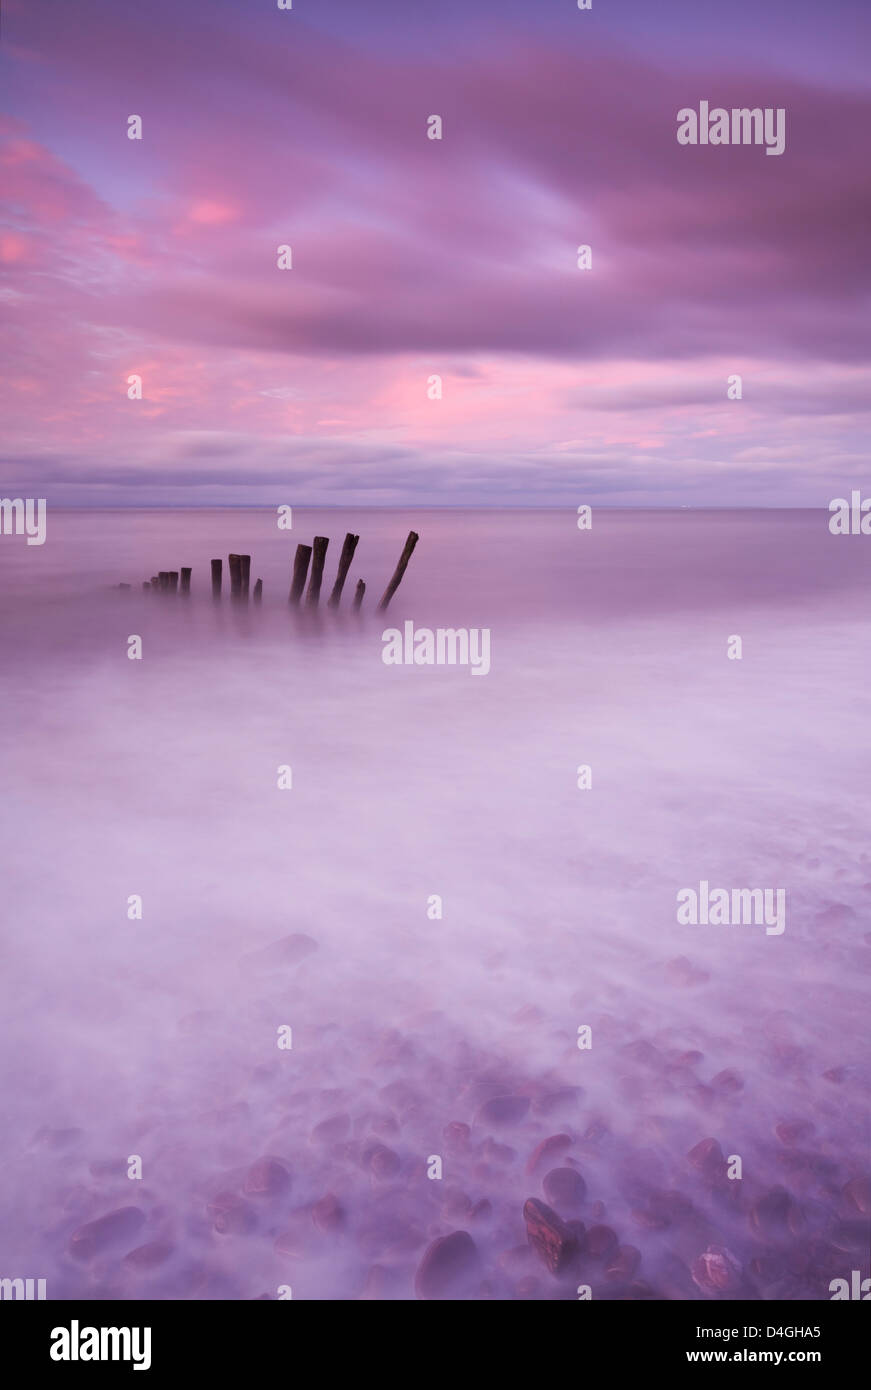 Wooden posts at high tide on Porlock Beach, Exmoor, Somerset. - Stock Image